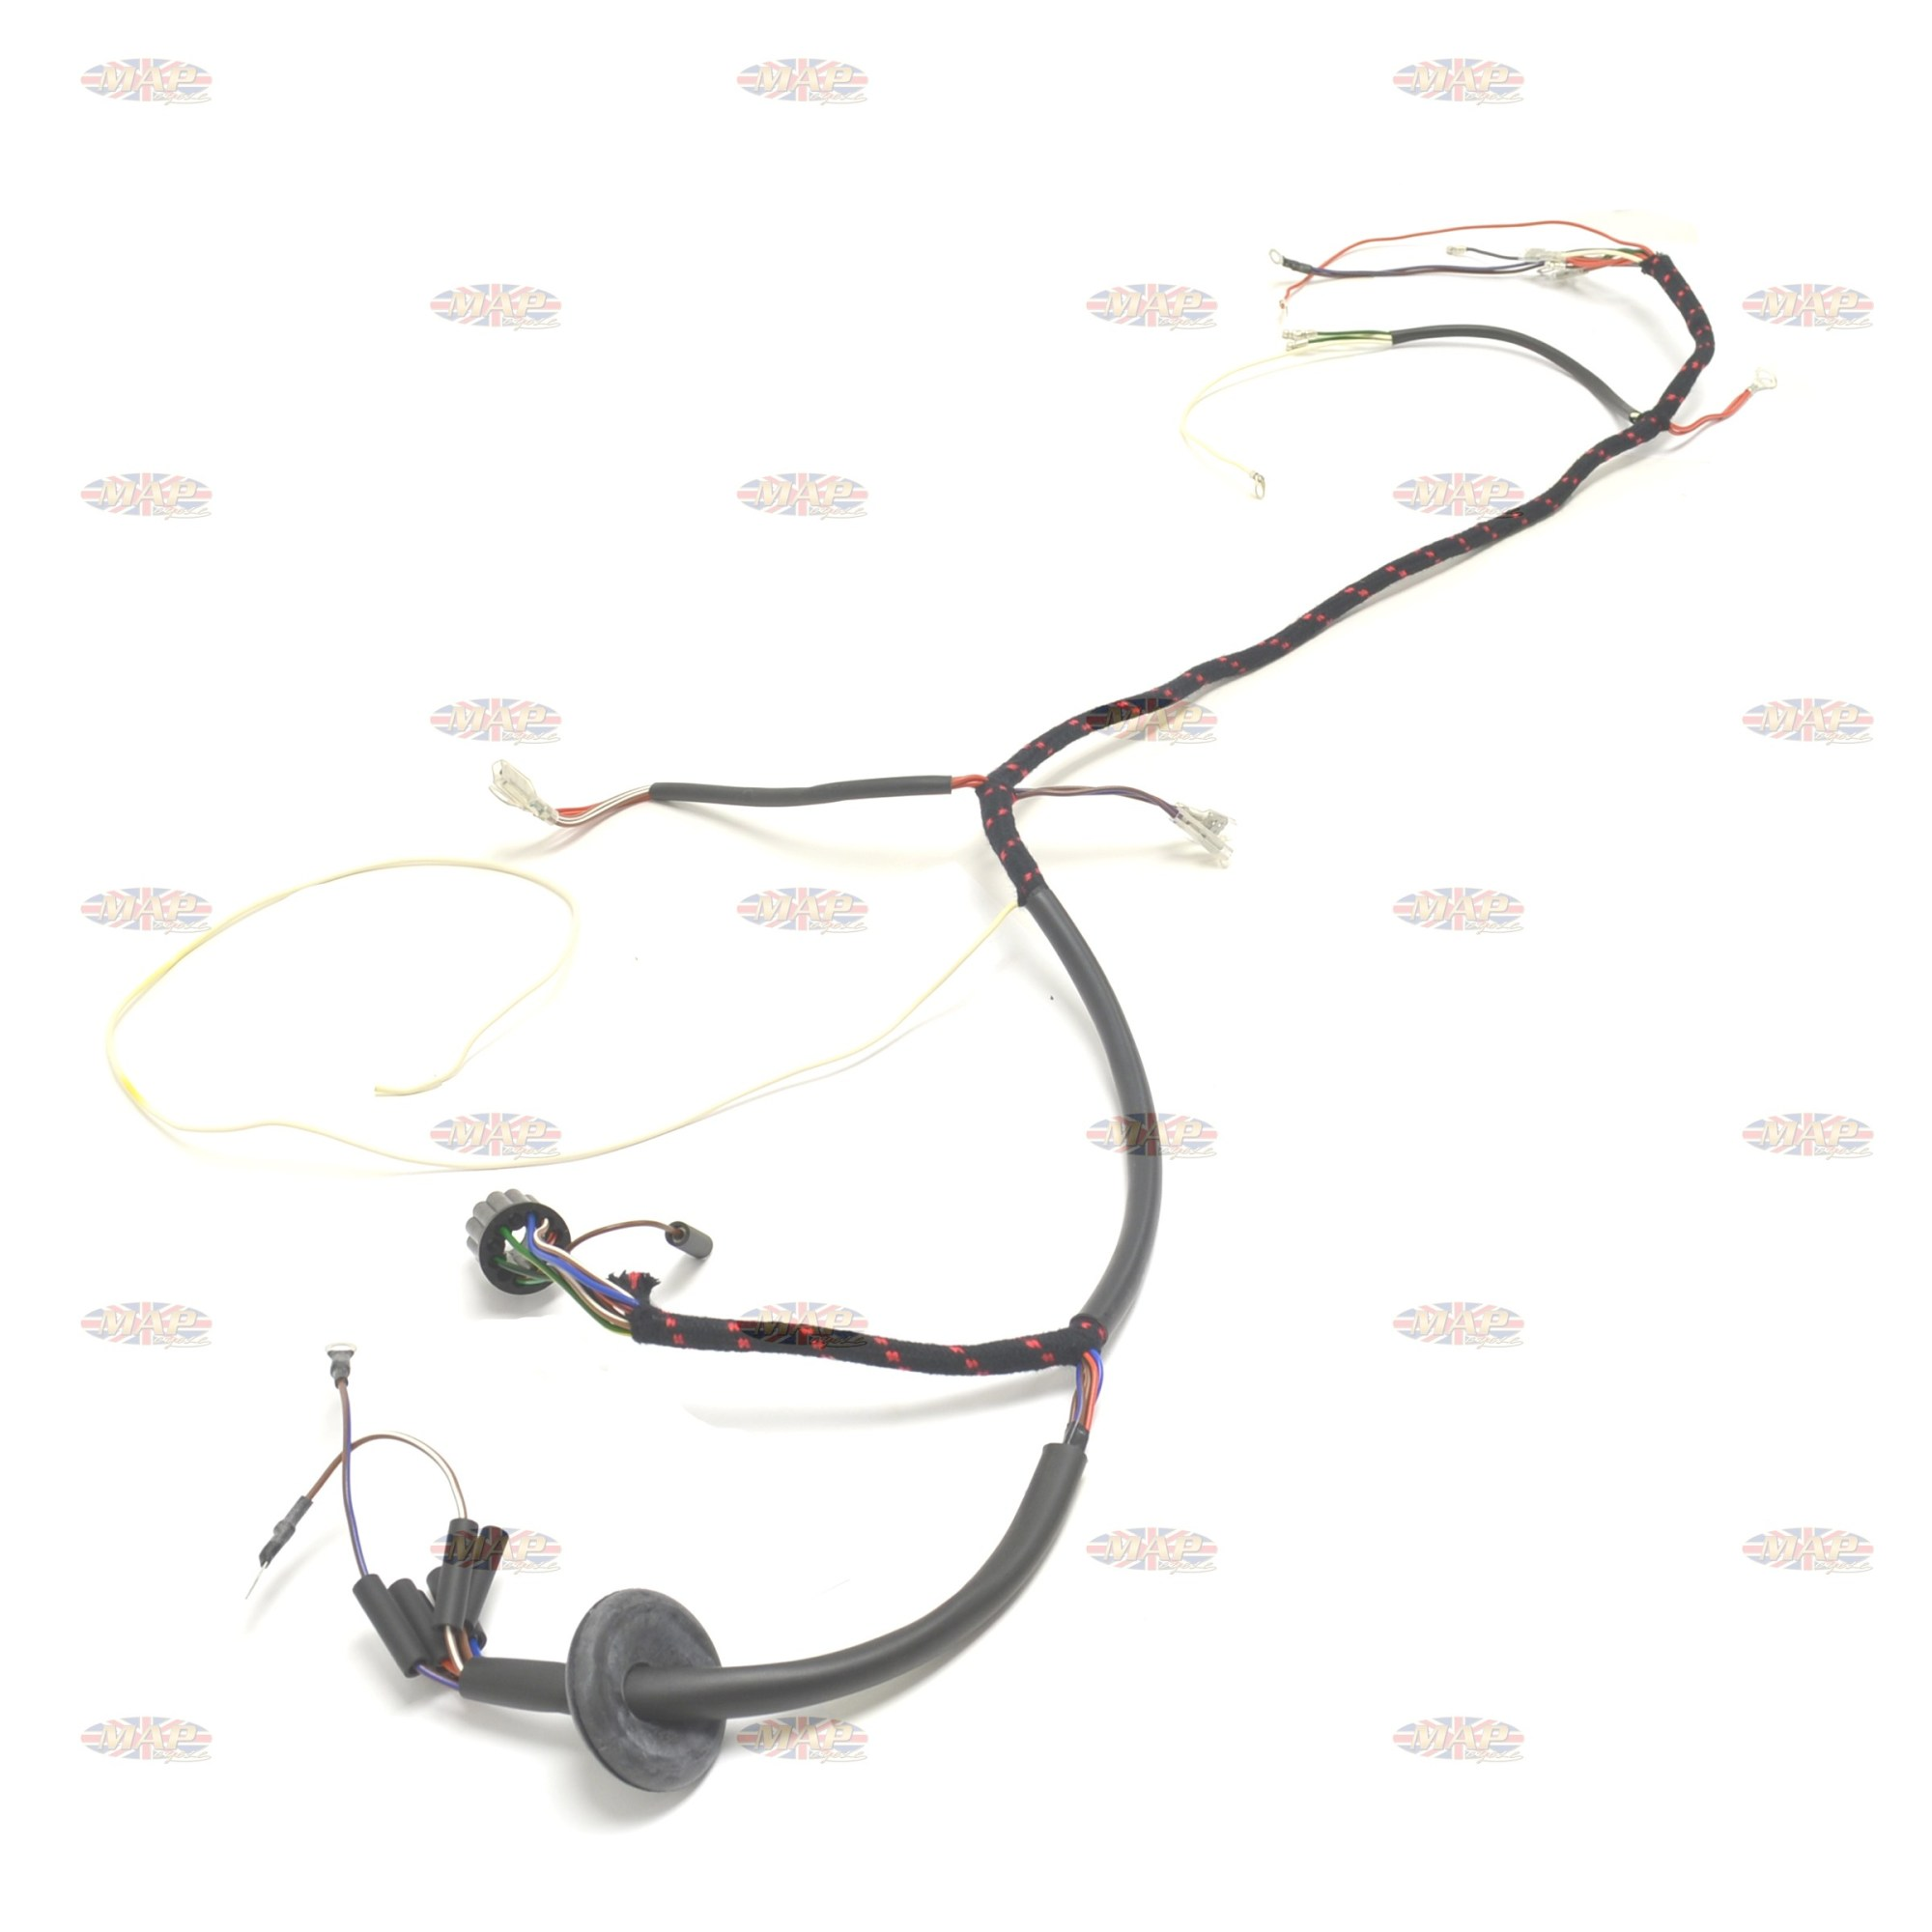 hight resolution of norton 1964 67 650ss 750 atlas uk made 12 volt wiring harness ford 9n 12 volt wiring harness 12 volt wiring harness